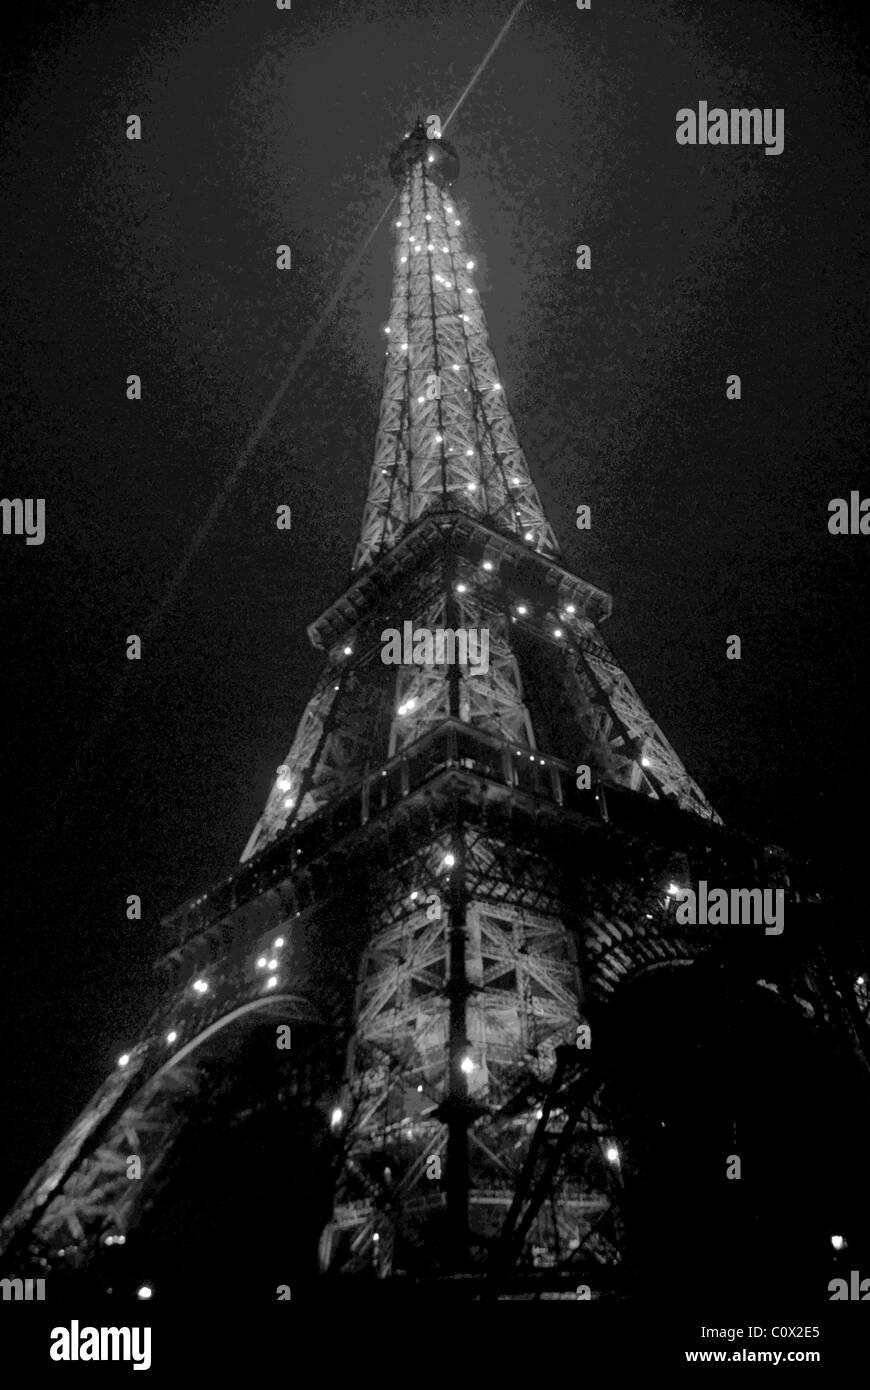 eiffel tower twinkling lights stock photos eiffel tower twinkling